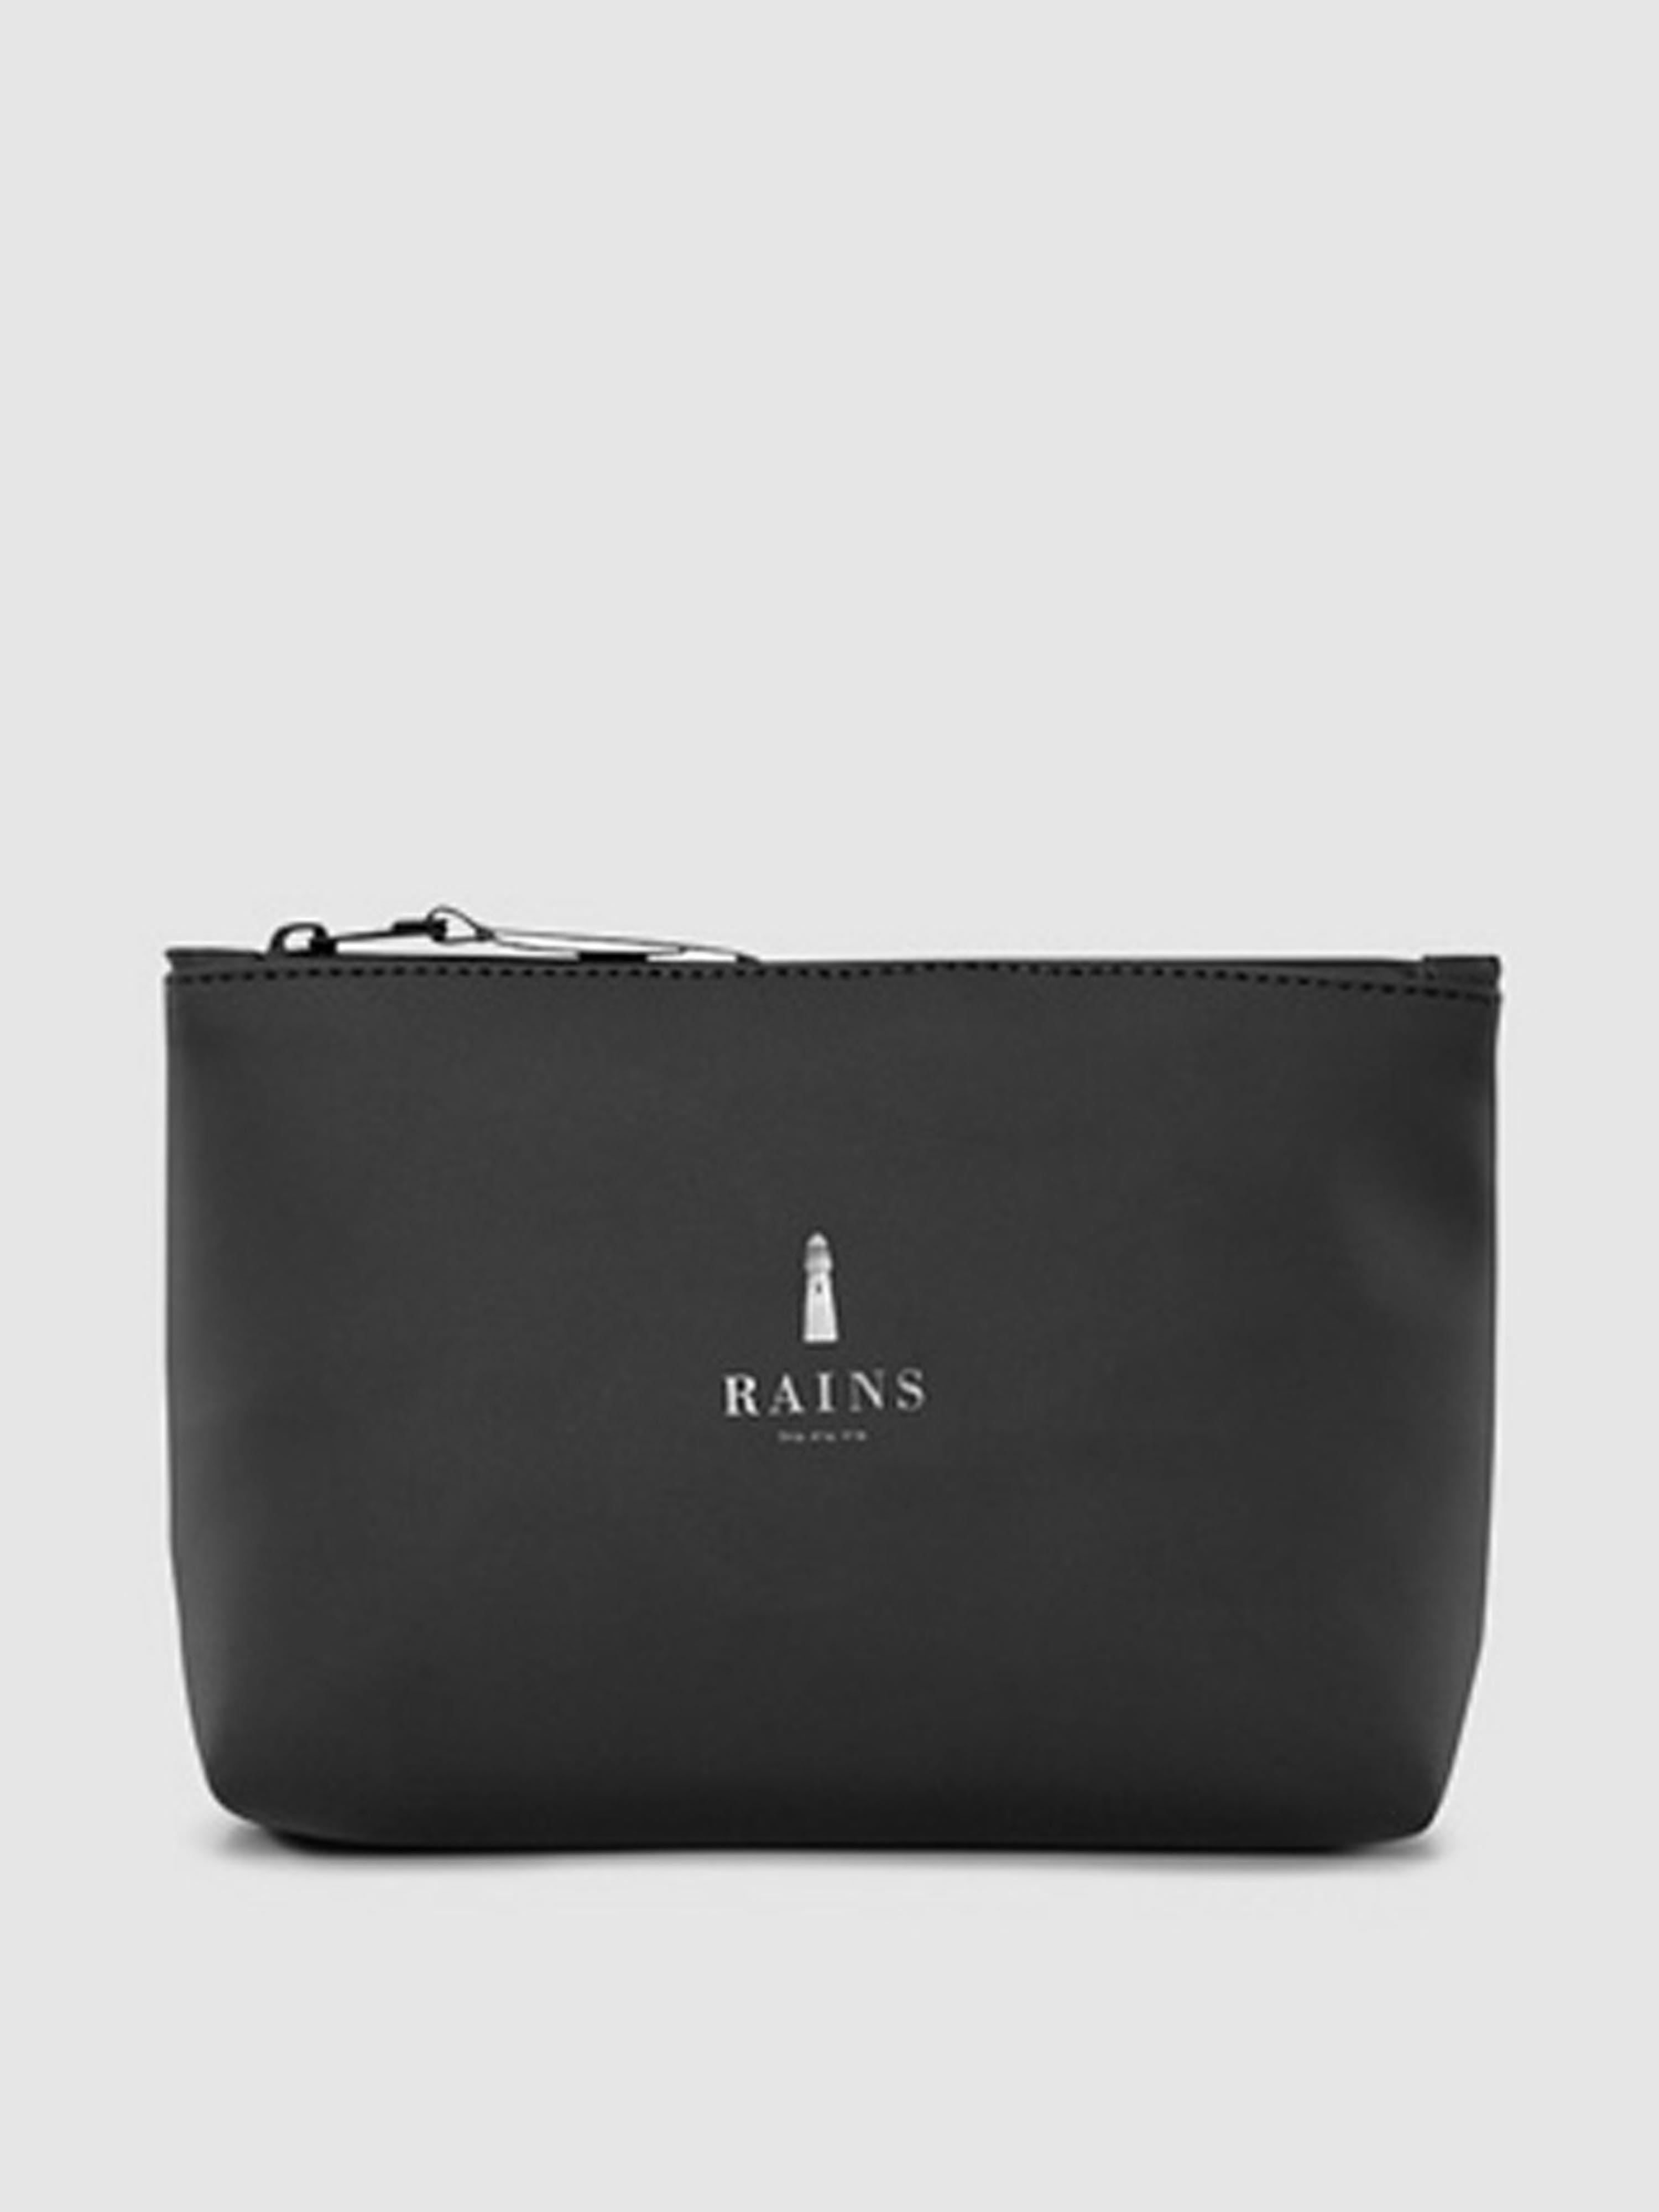 Rains Cosmetic Bag  - Black